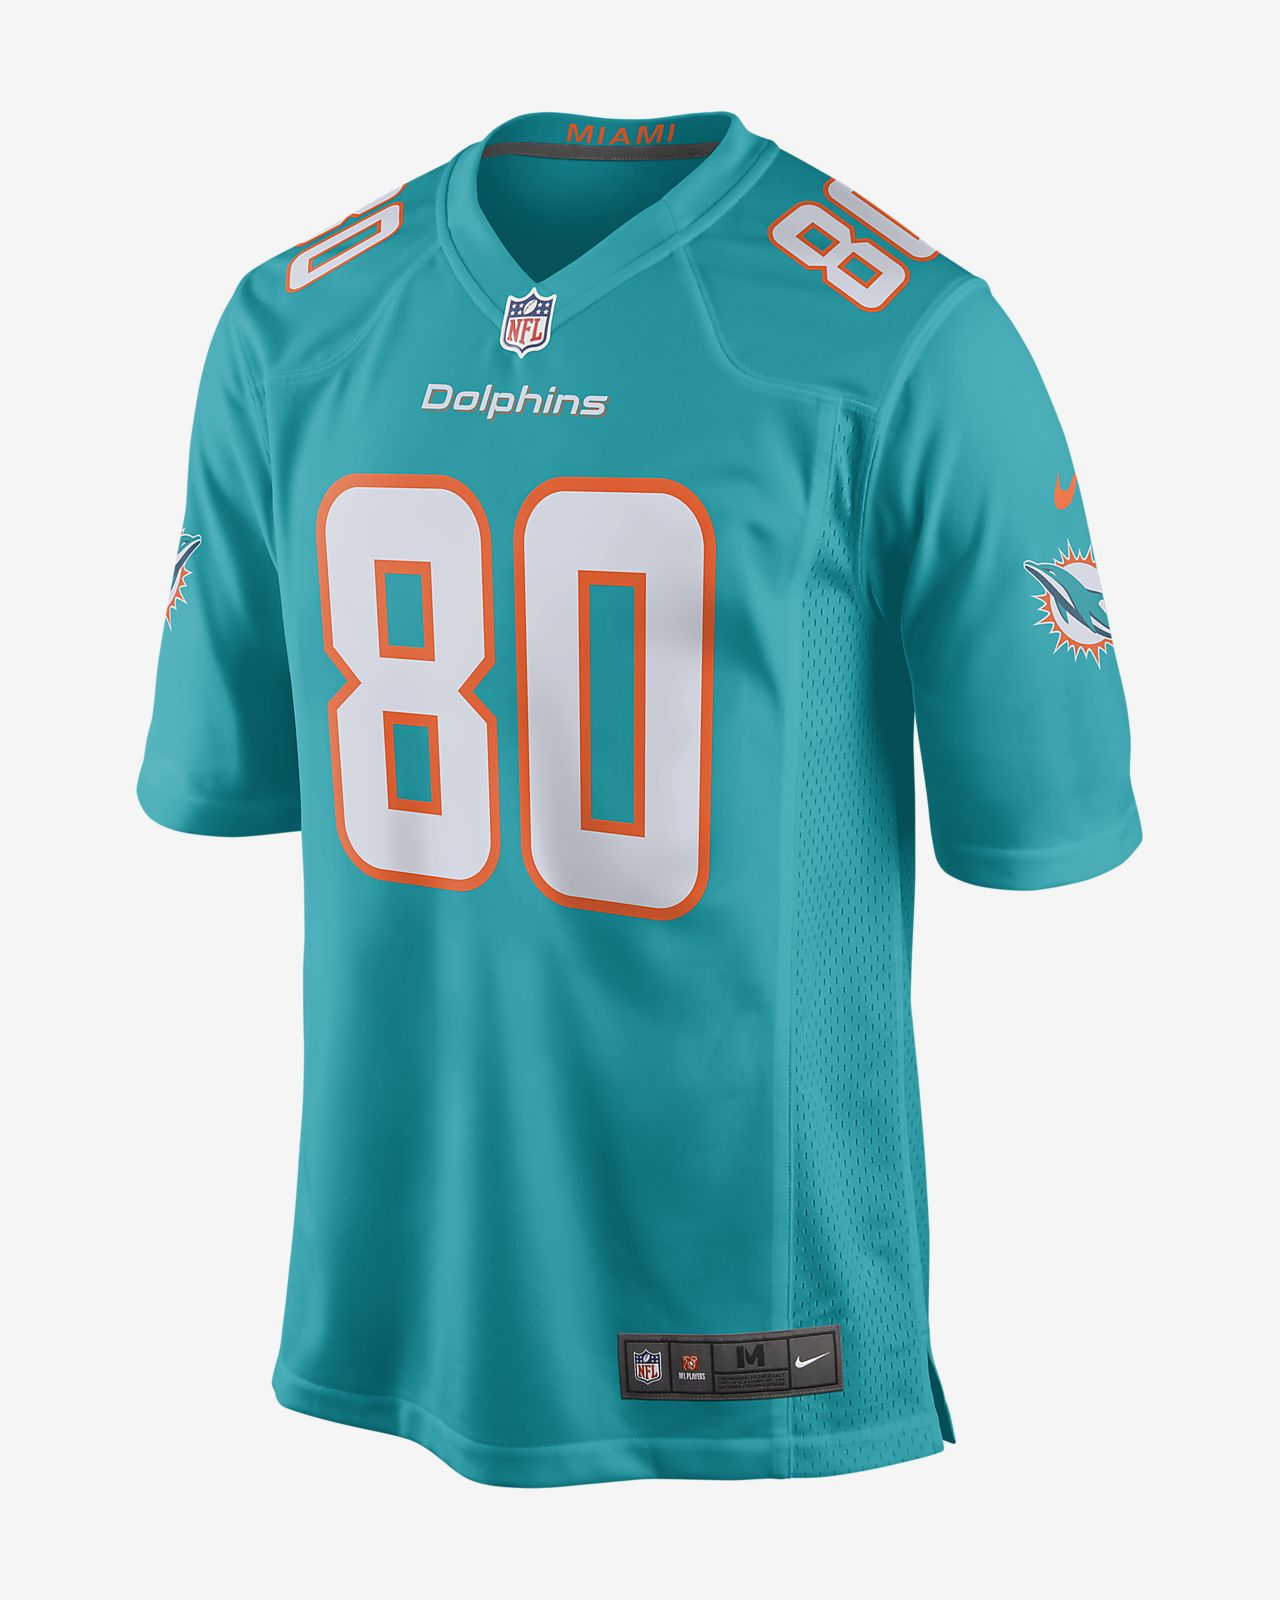 buy popular af40e 110b0 NFL Miami Dolphins (Danny Amendola) Men's Game American Football Jersey